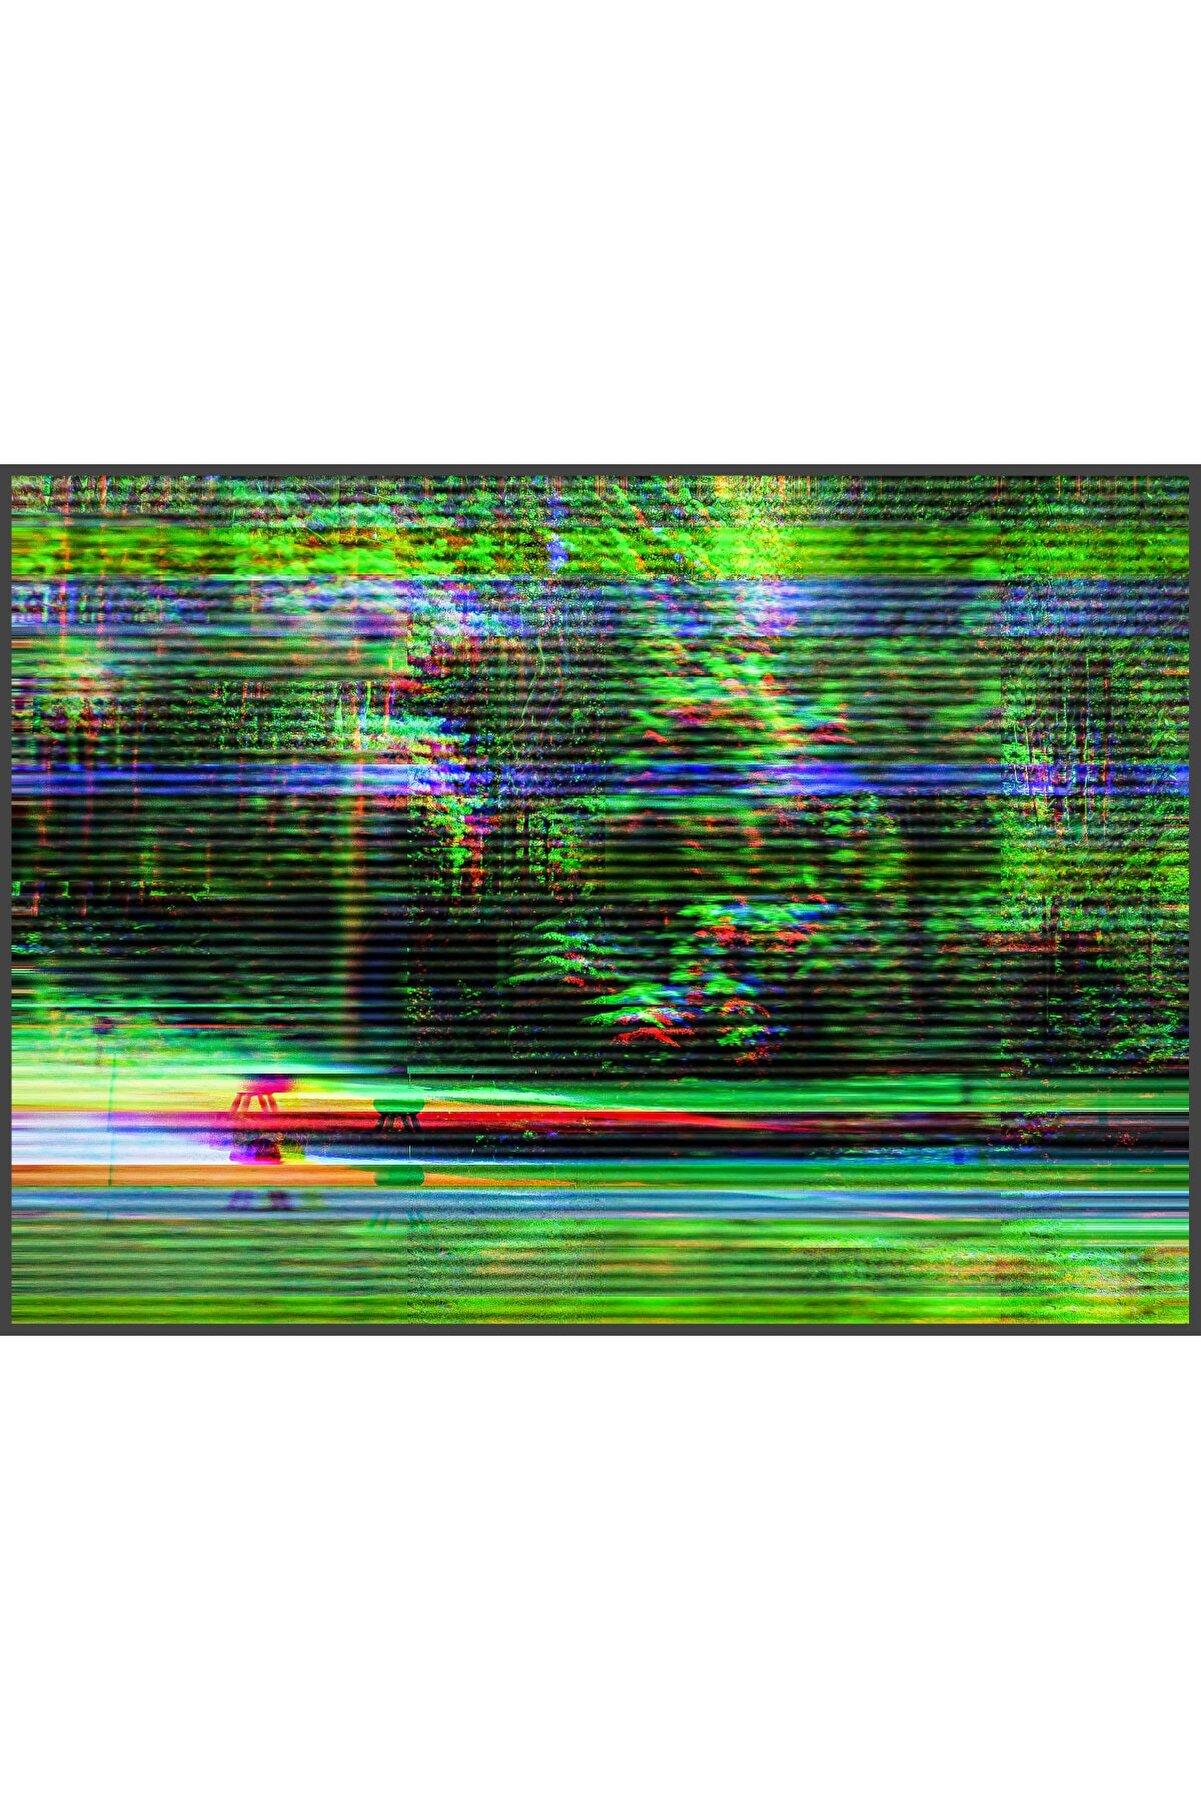 Nazım Arslan 'Memory And Actuality Serisi', 18,5x25,5, Dijital Fotoğraf